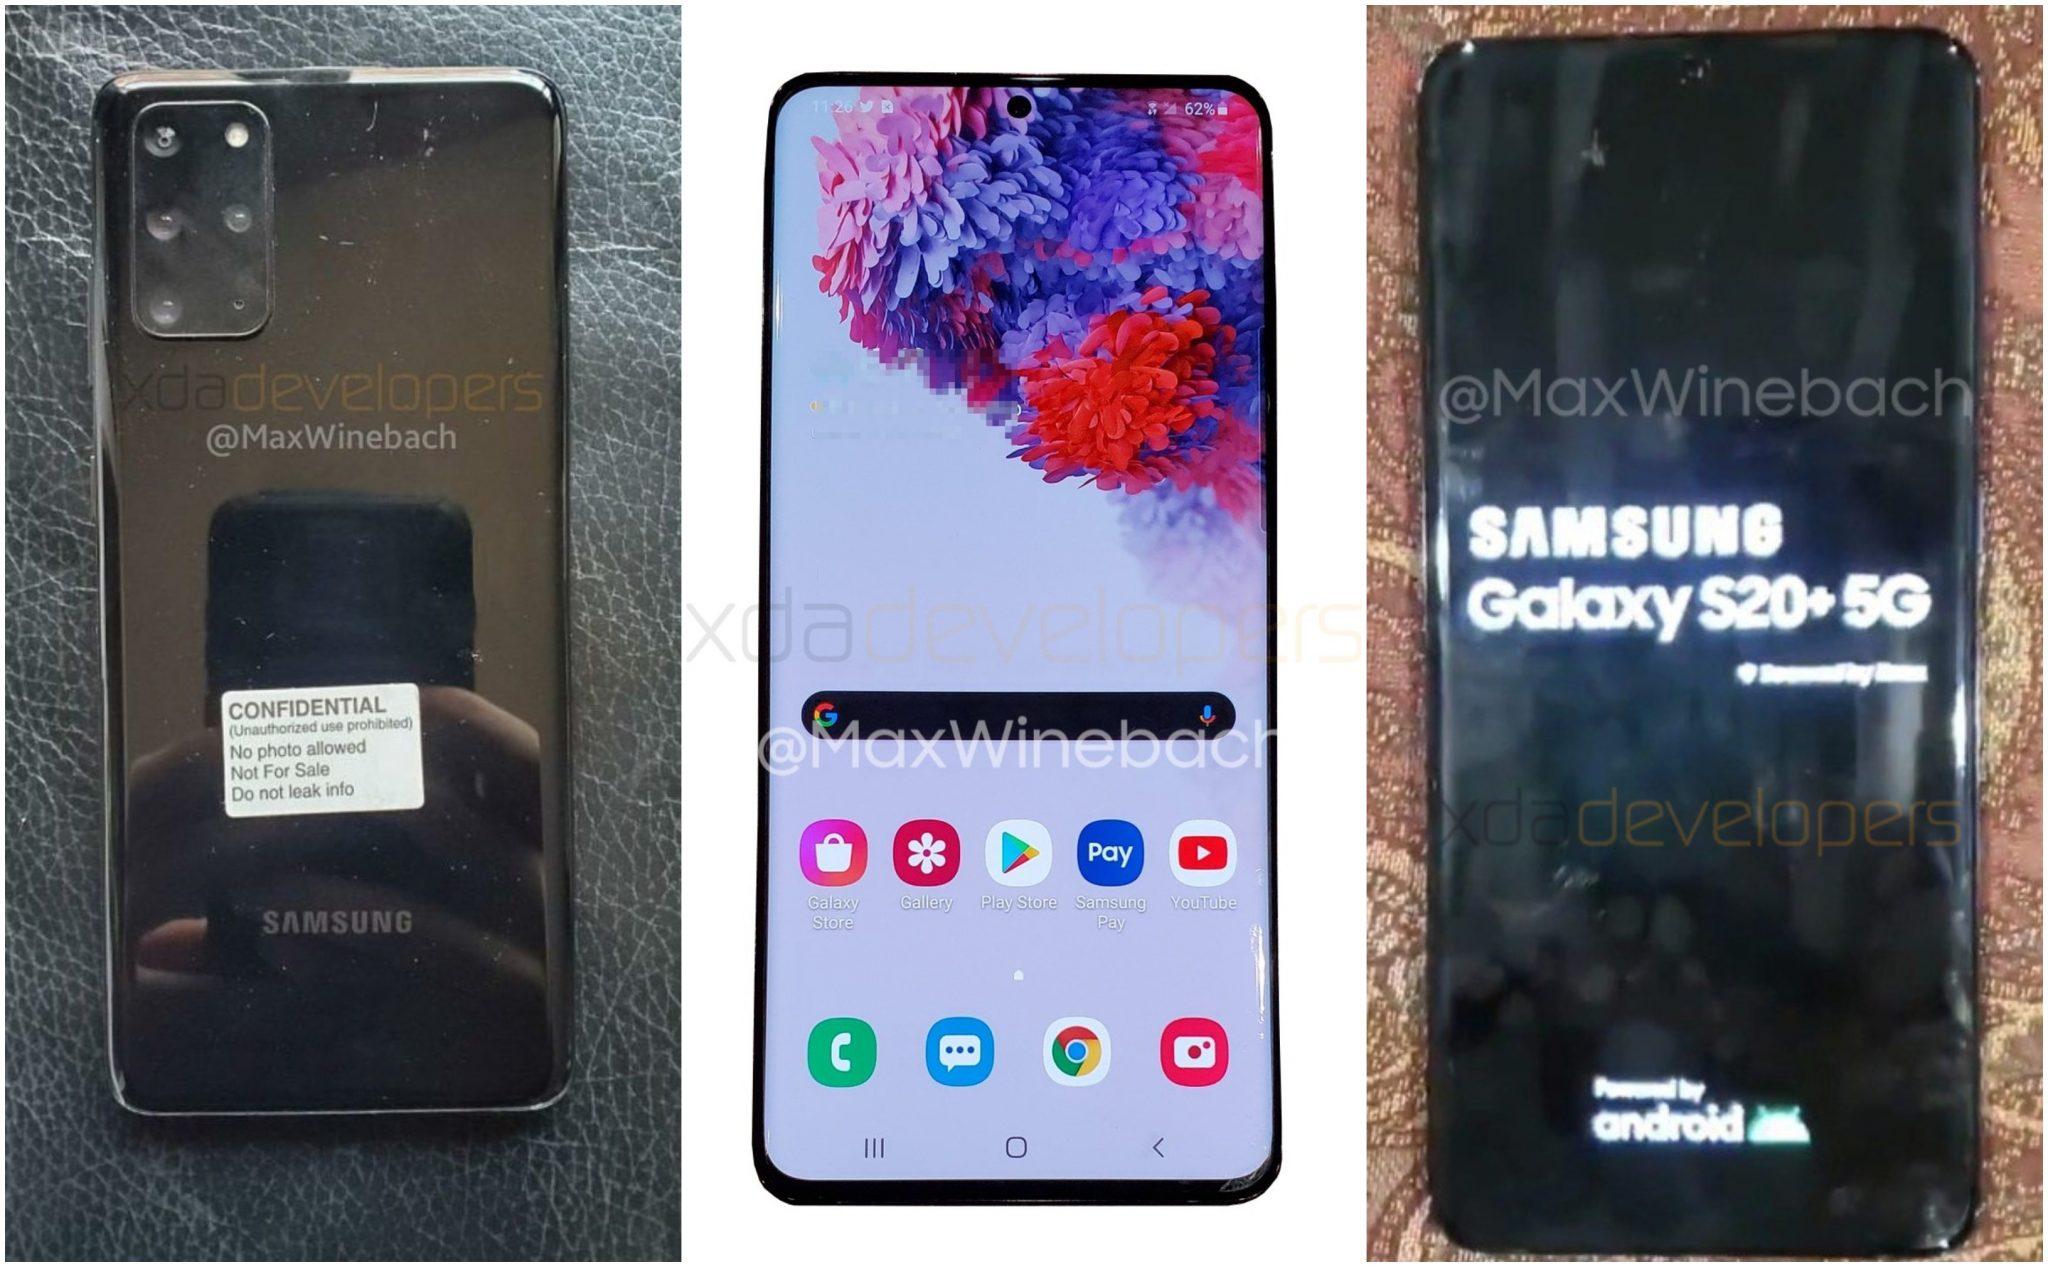 Samsung Galaxy S20+ 5G Live